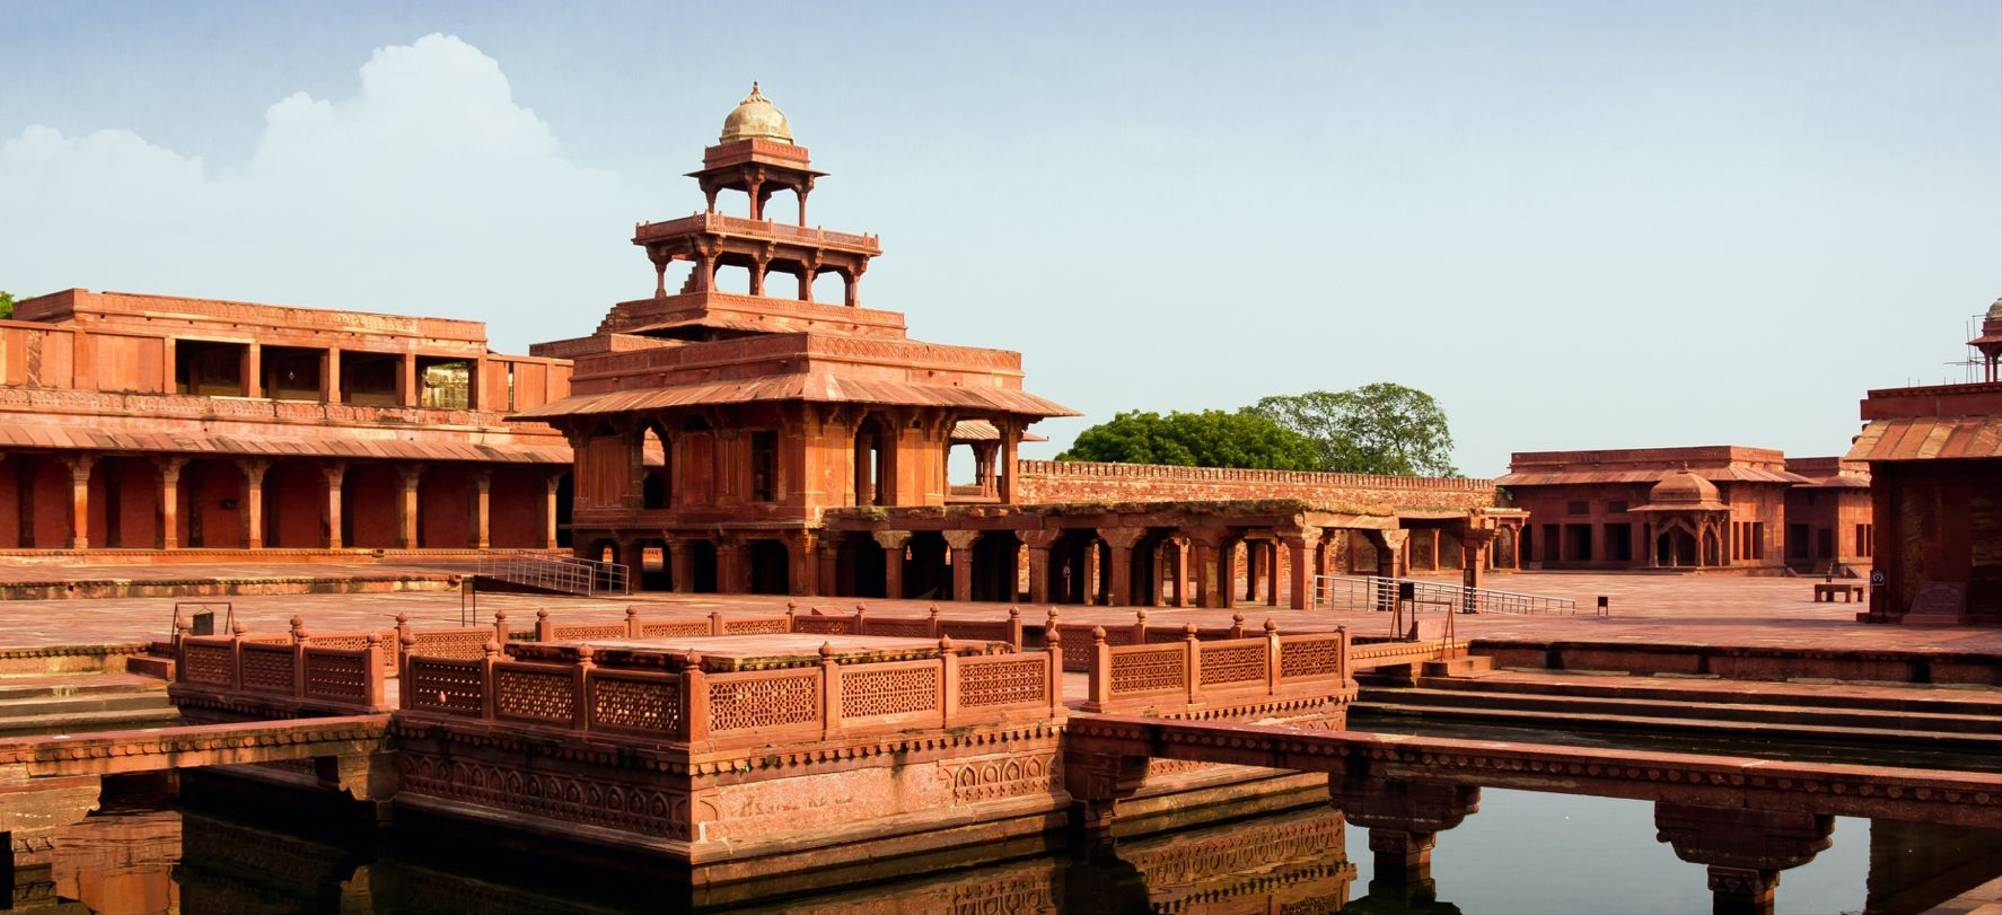 Jaipur   Fatehpur Sikri   Itinerary Desktop